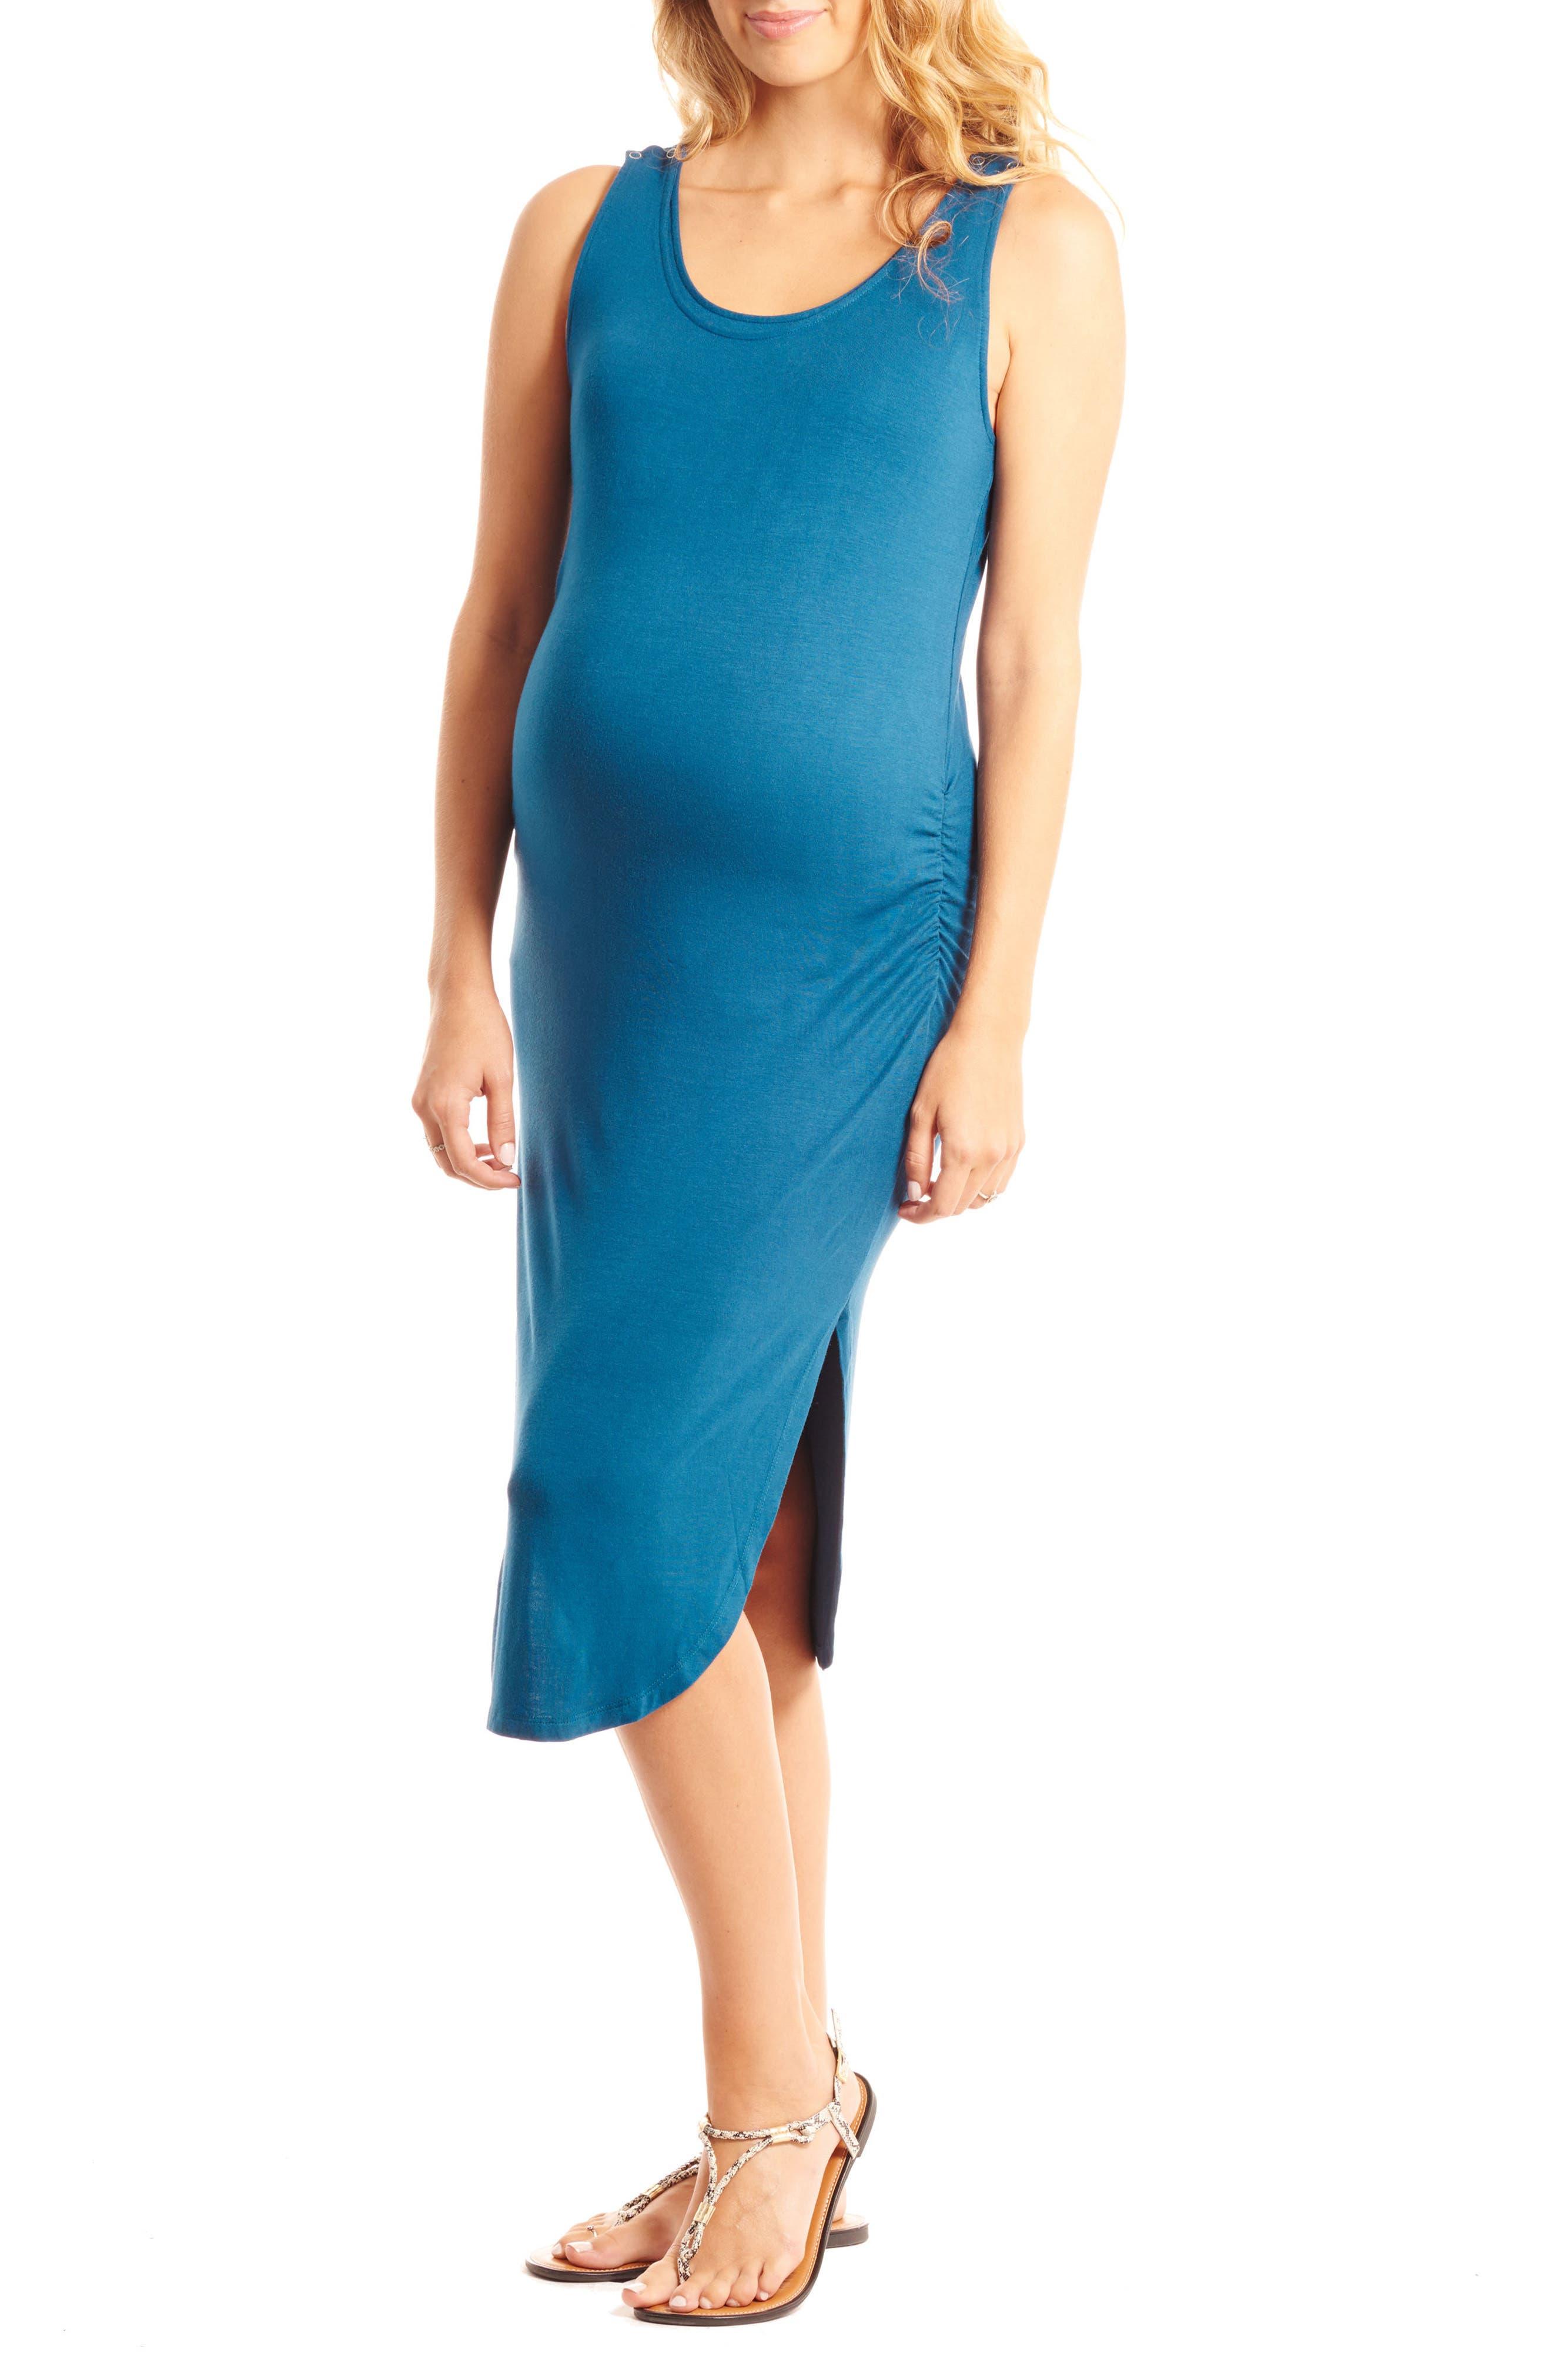 Demi Maternity/Nursing Dress,                         Main,                         color, 442